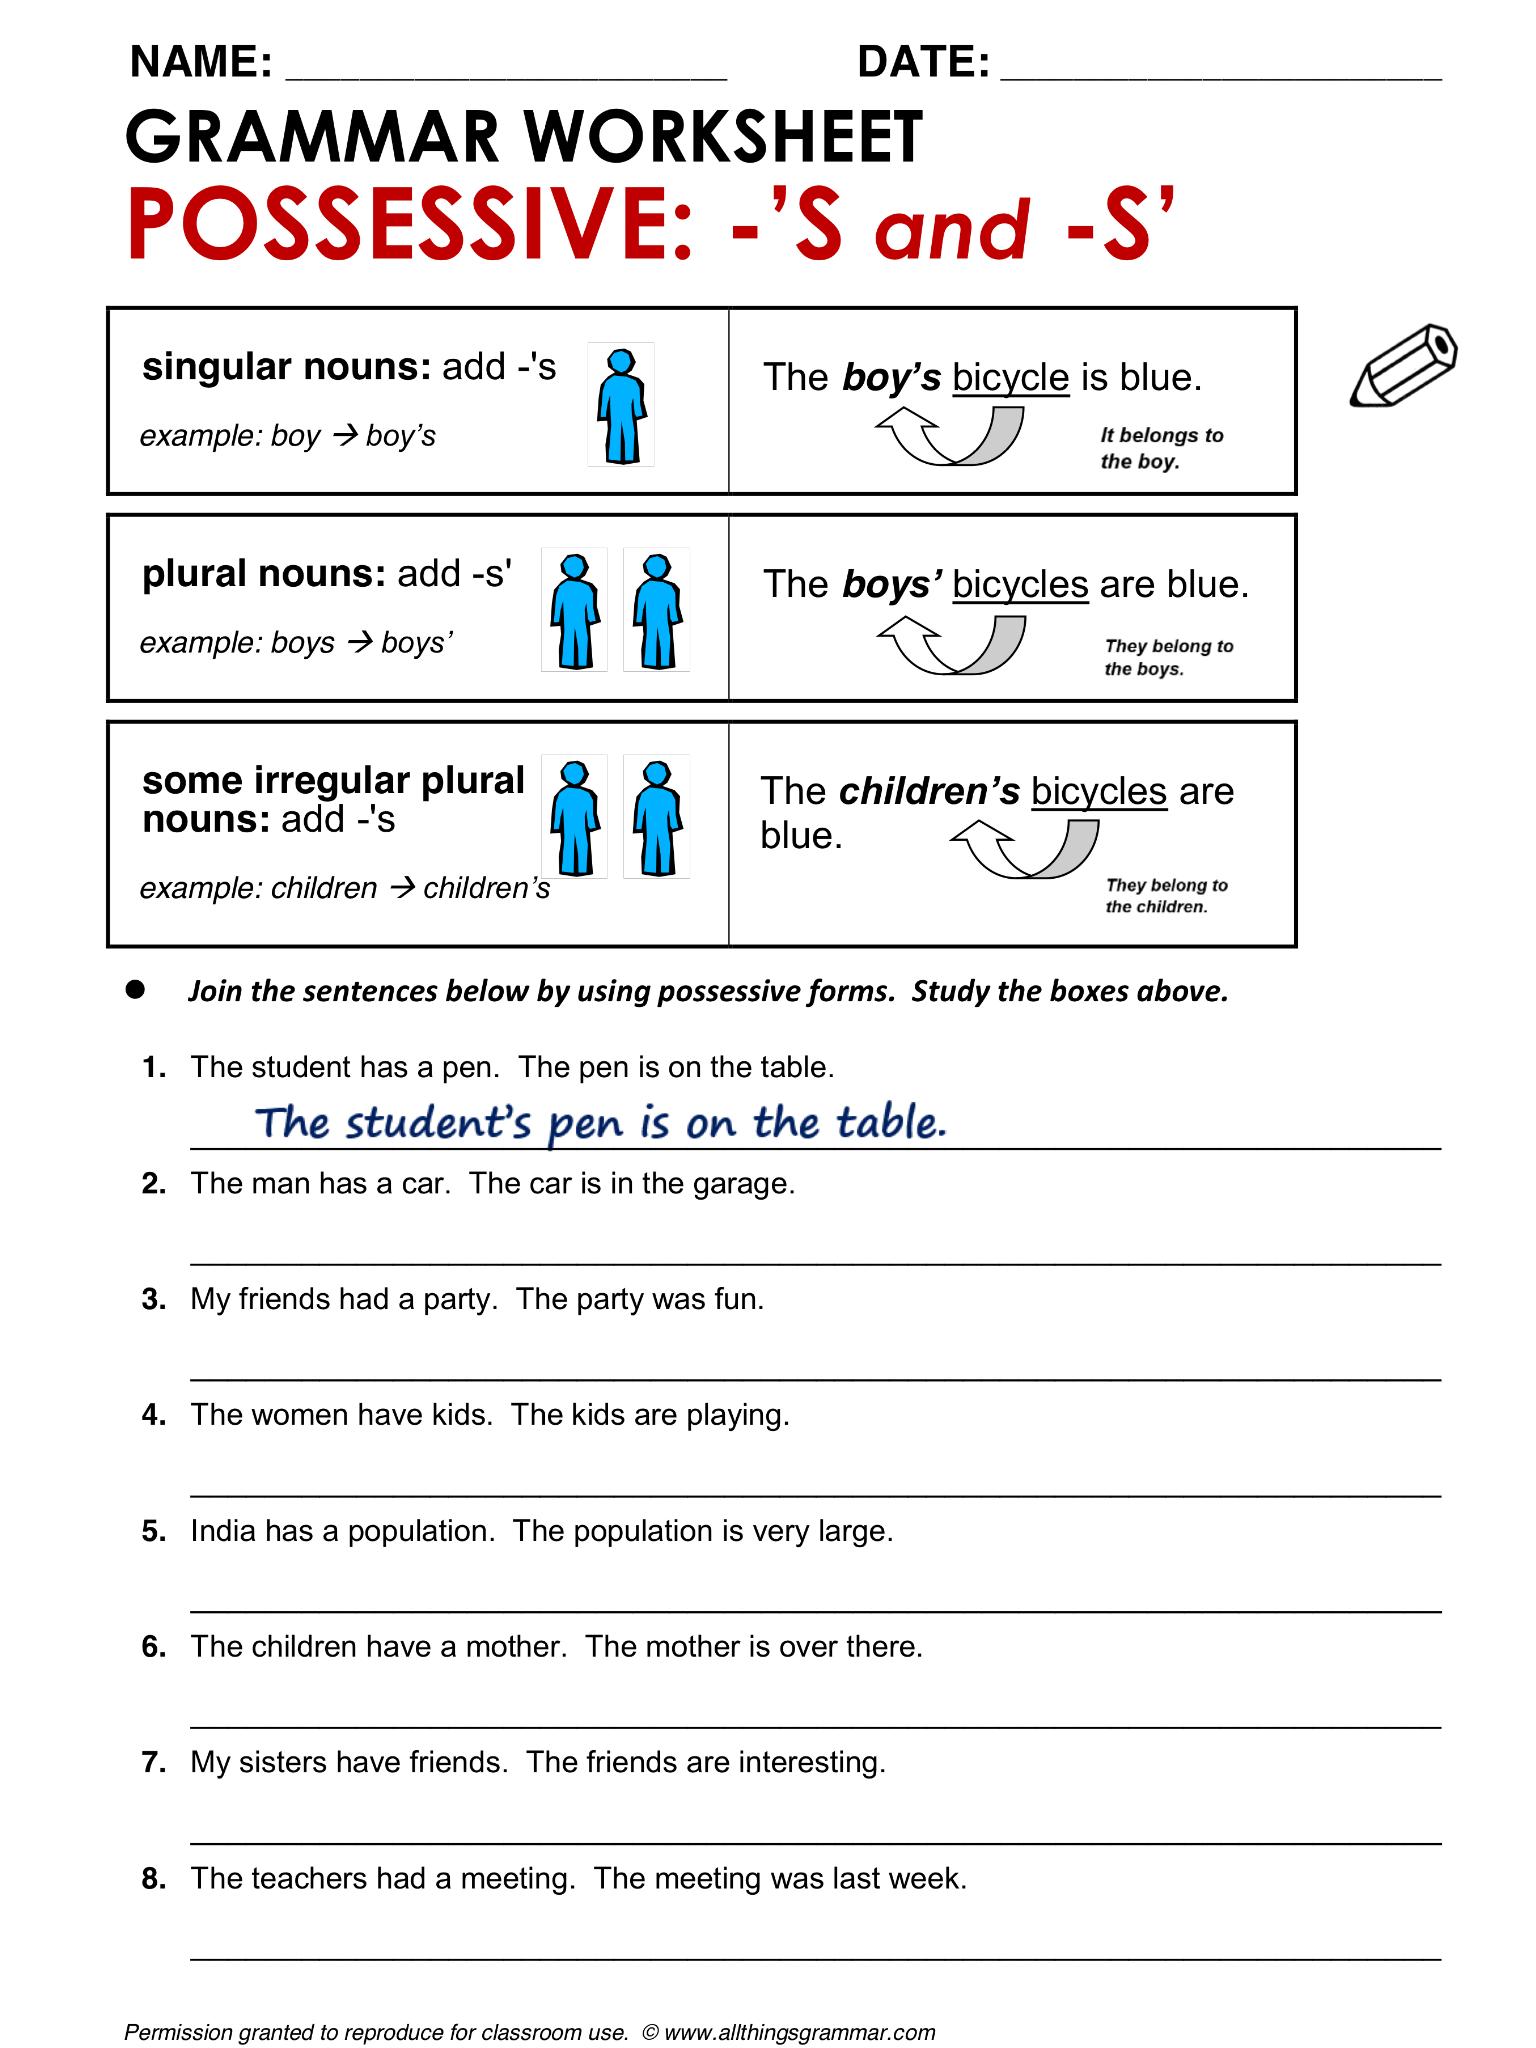 English Grammar Possessive S And S